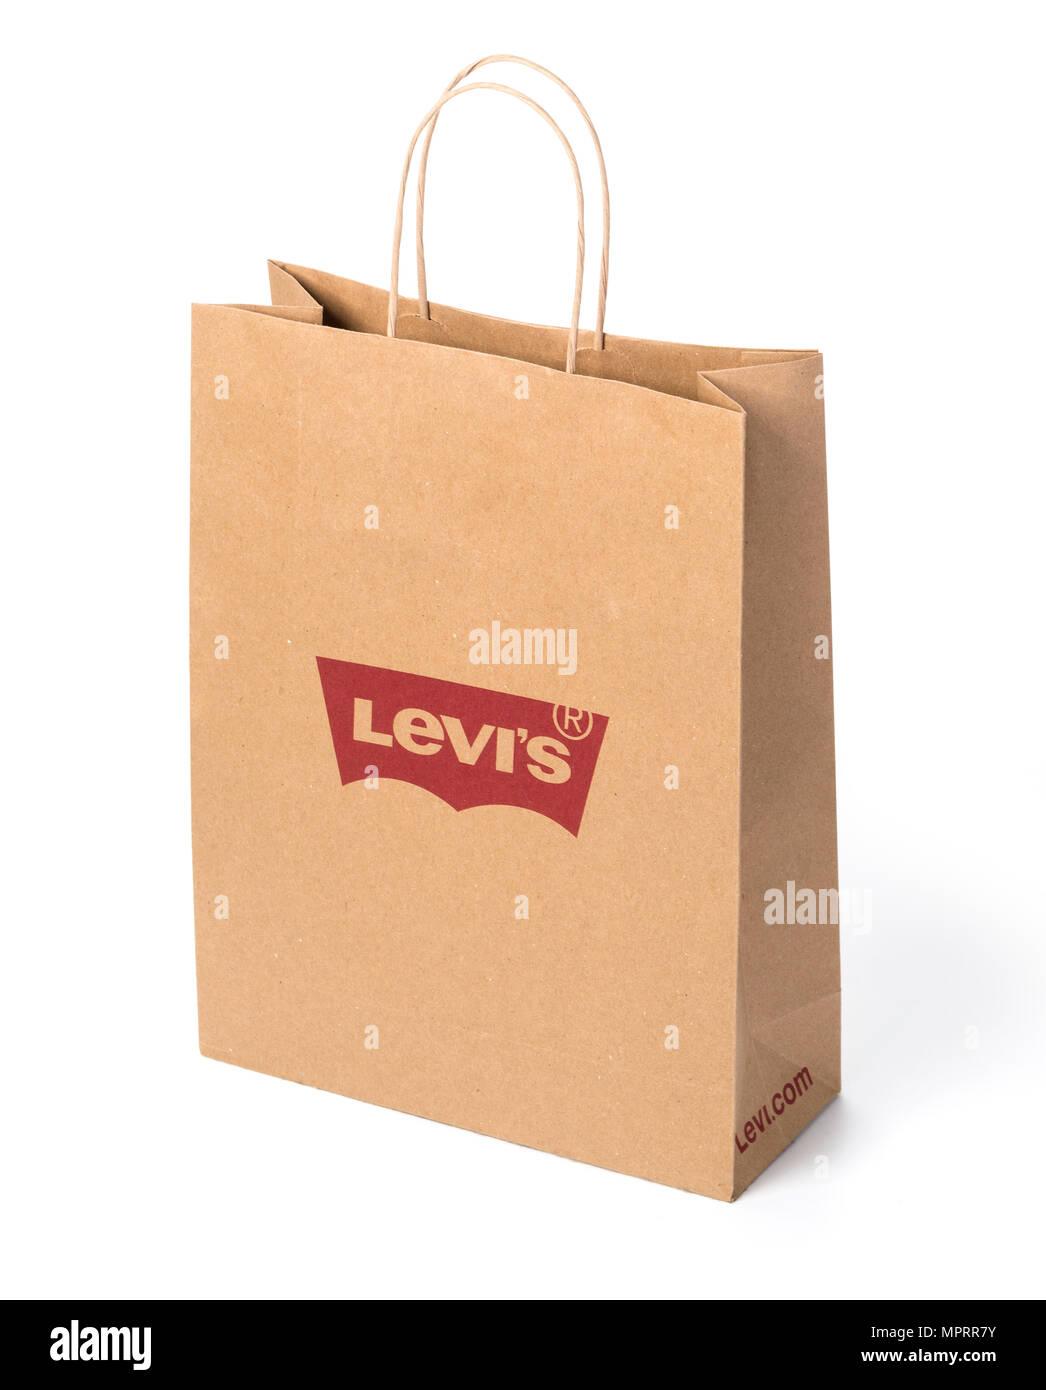 36f0cc274e Levi s Jeans Store Stock Photos   Levi s Jeans Store Stock Images ...